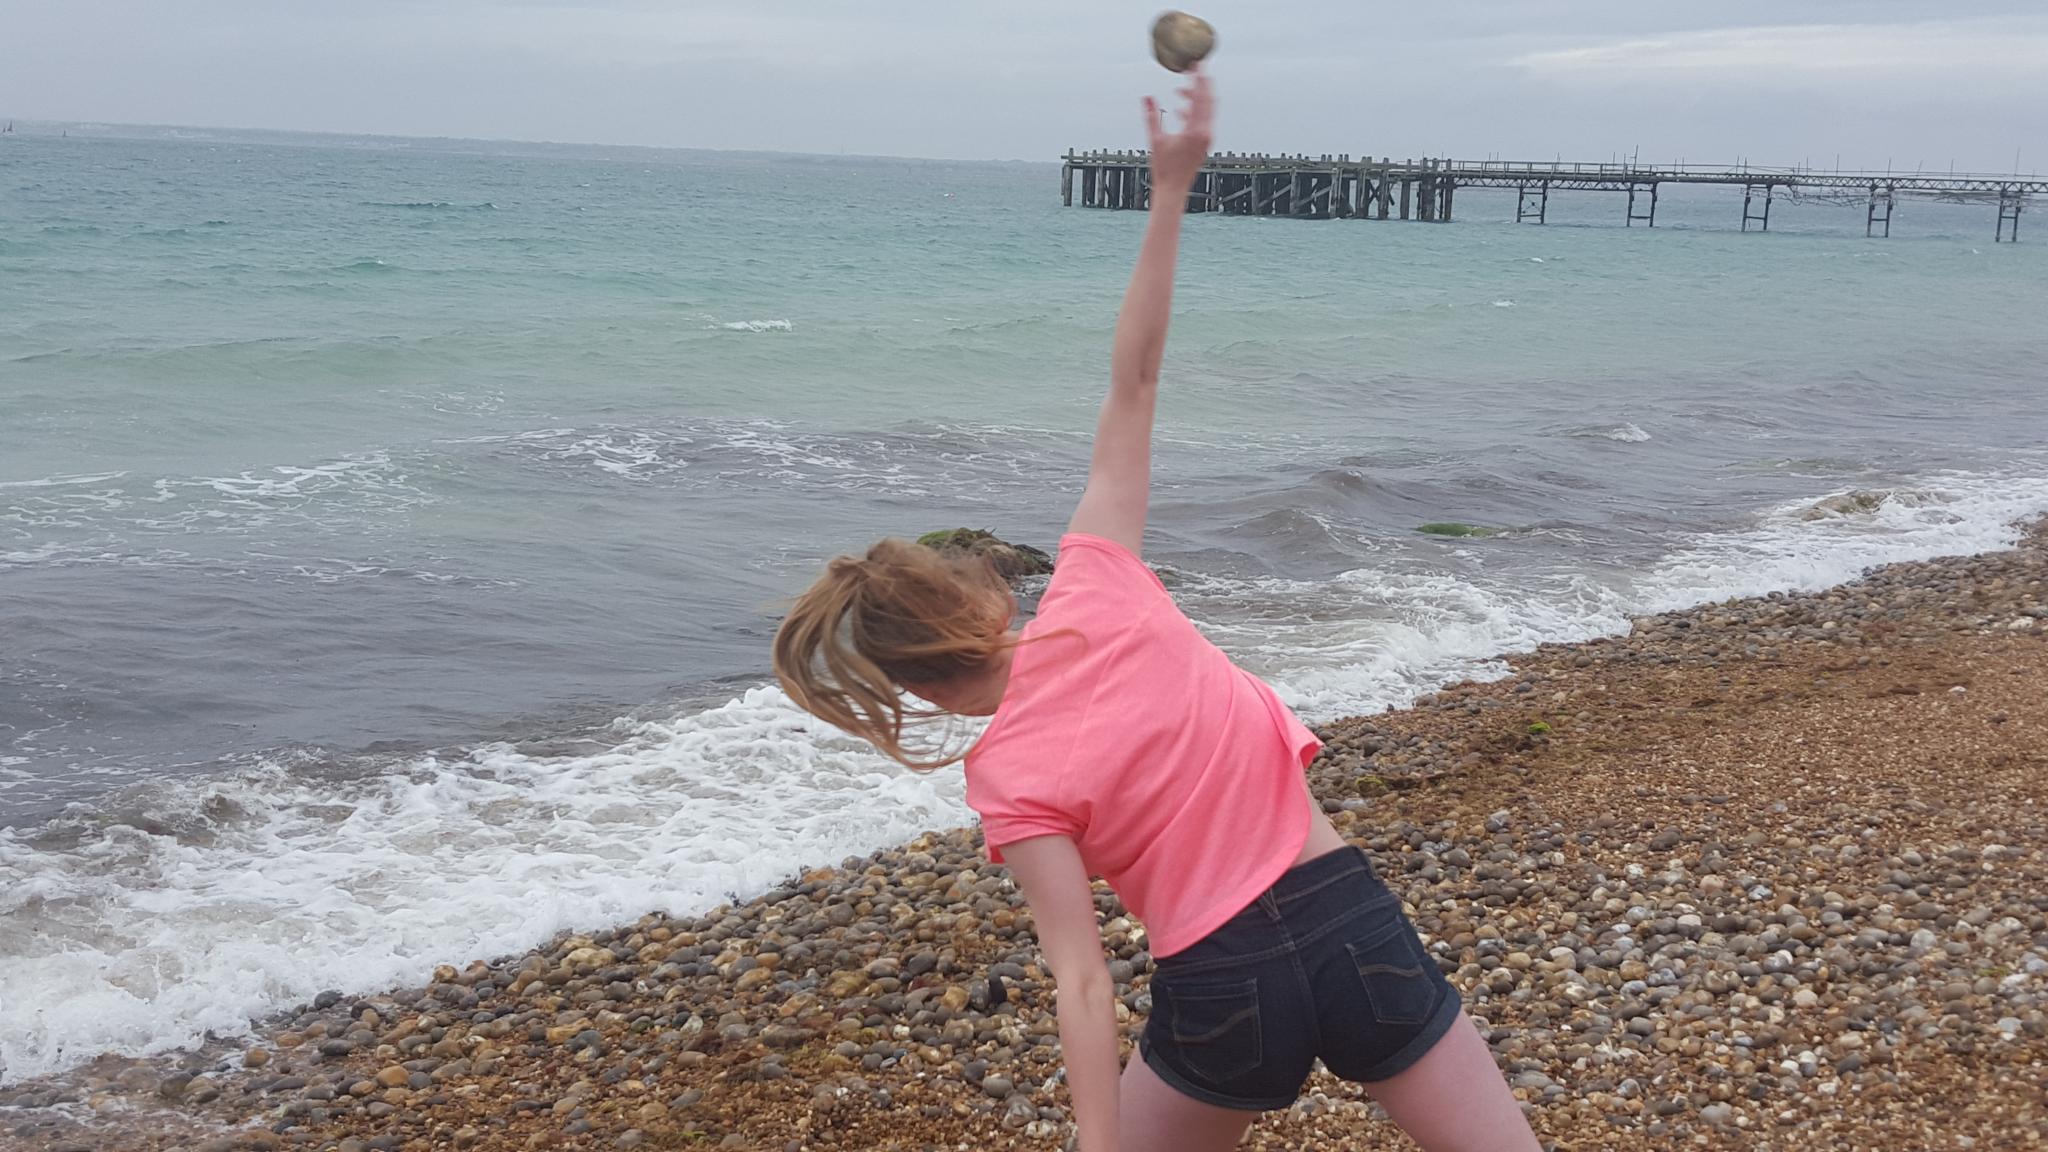 stone throwing at a beach by Jan.ohnokt